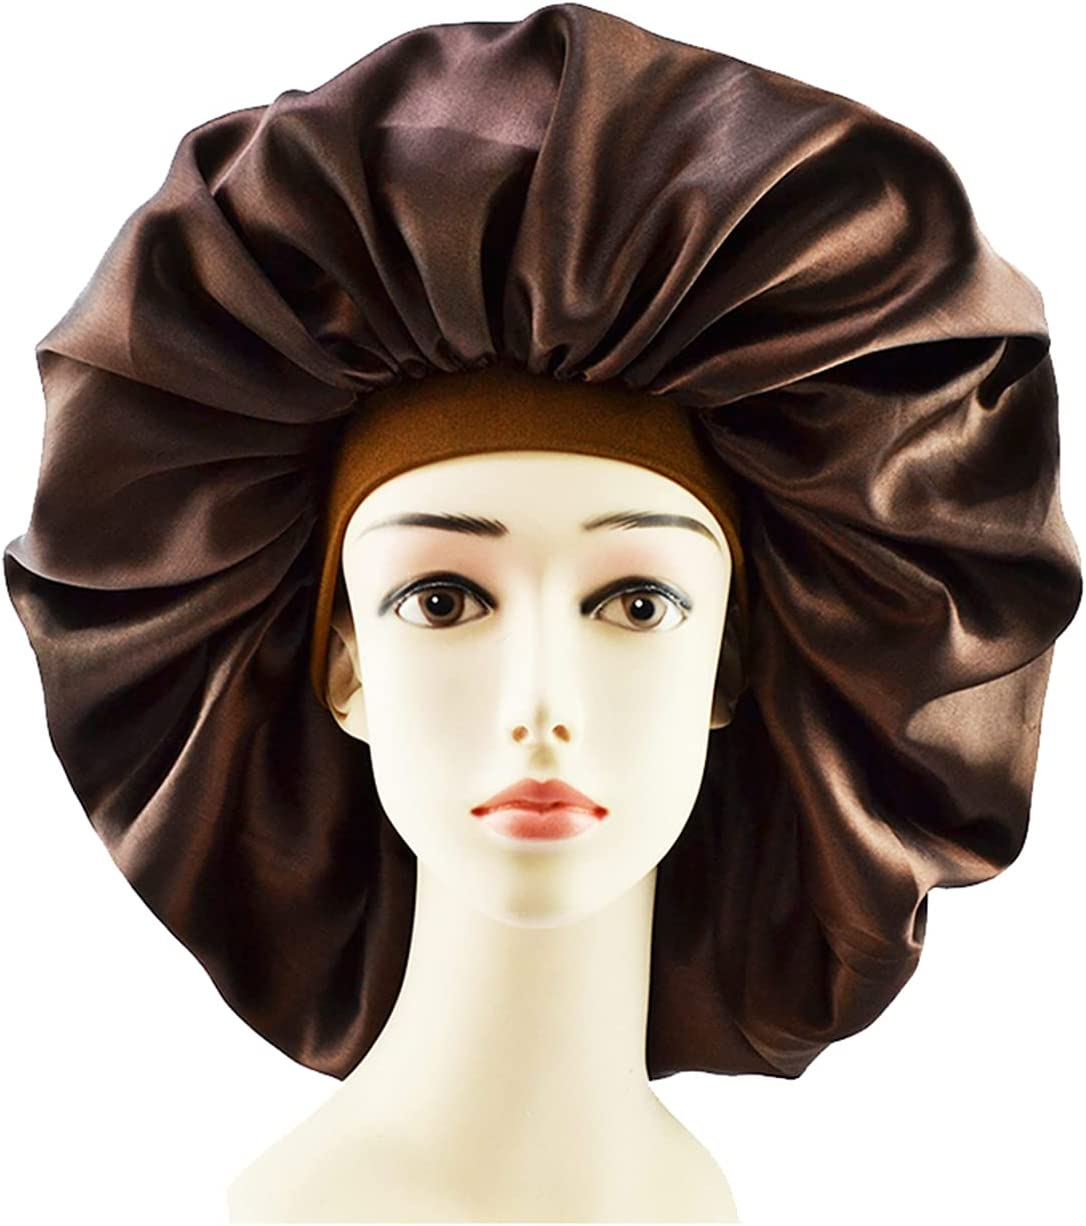 GEQIAN Gorro de ducha impermeable para mujer de tamaño grande, capó sedoso de satén – gorro de noche para dormir, impermeable, para gorro de ducha de pelo rizado con elástico